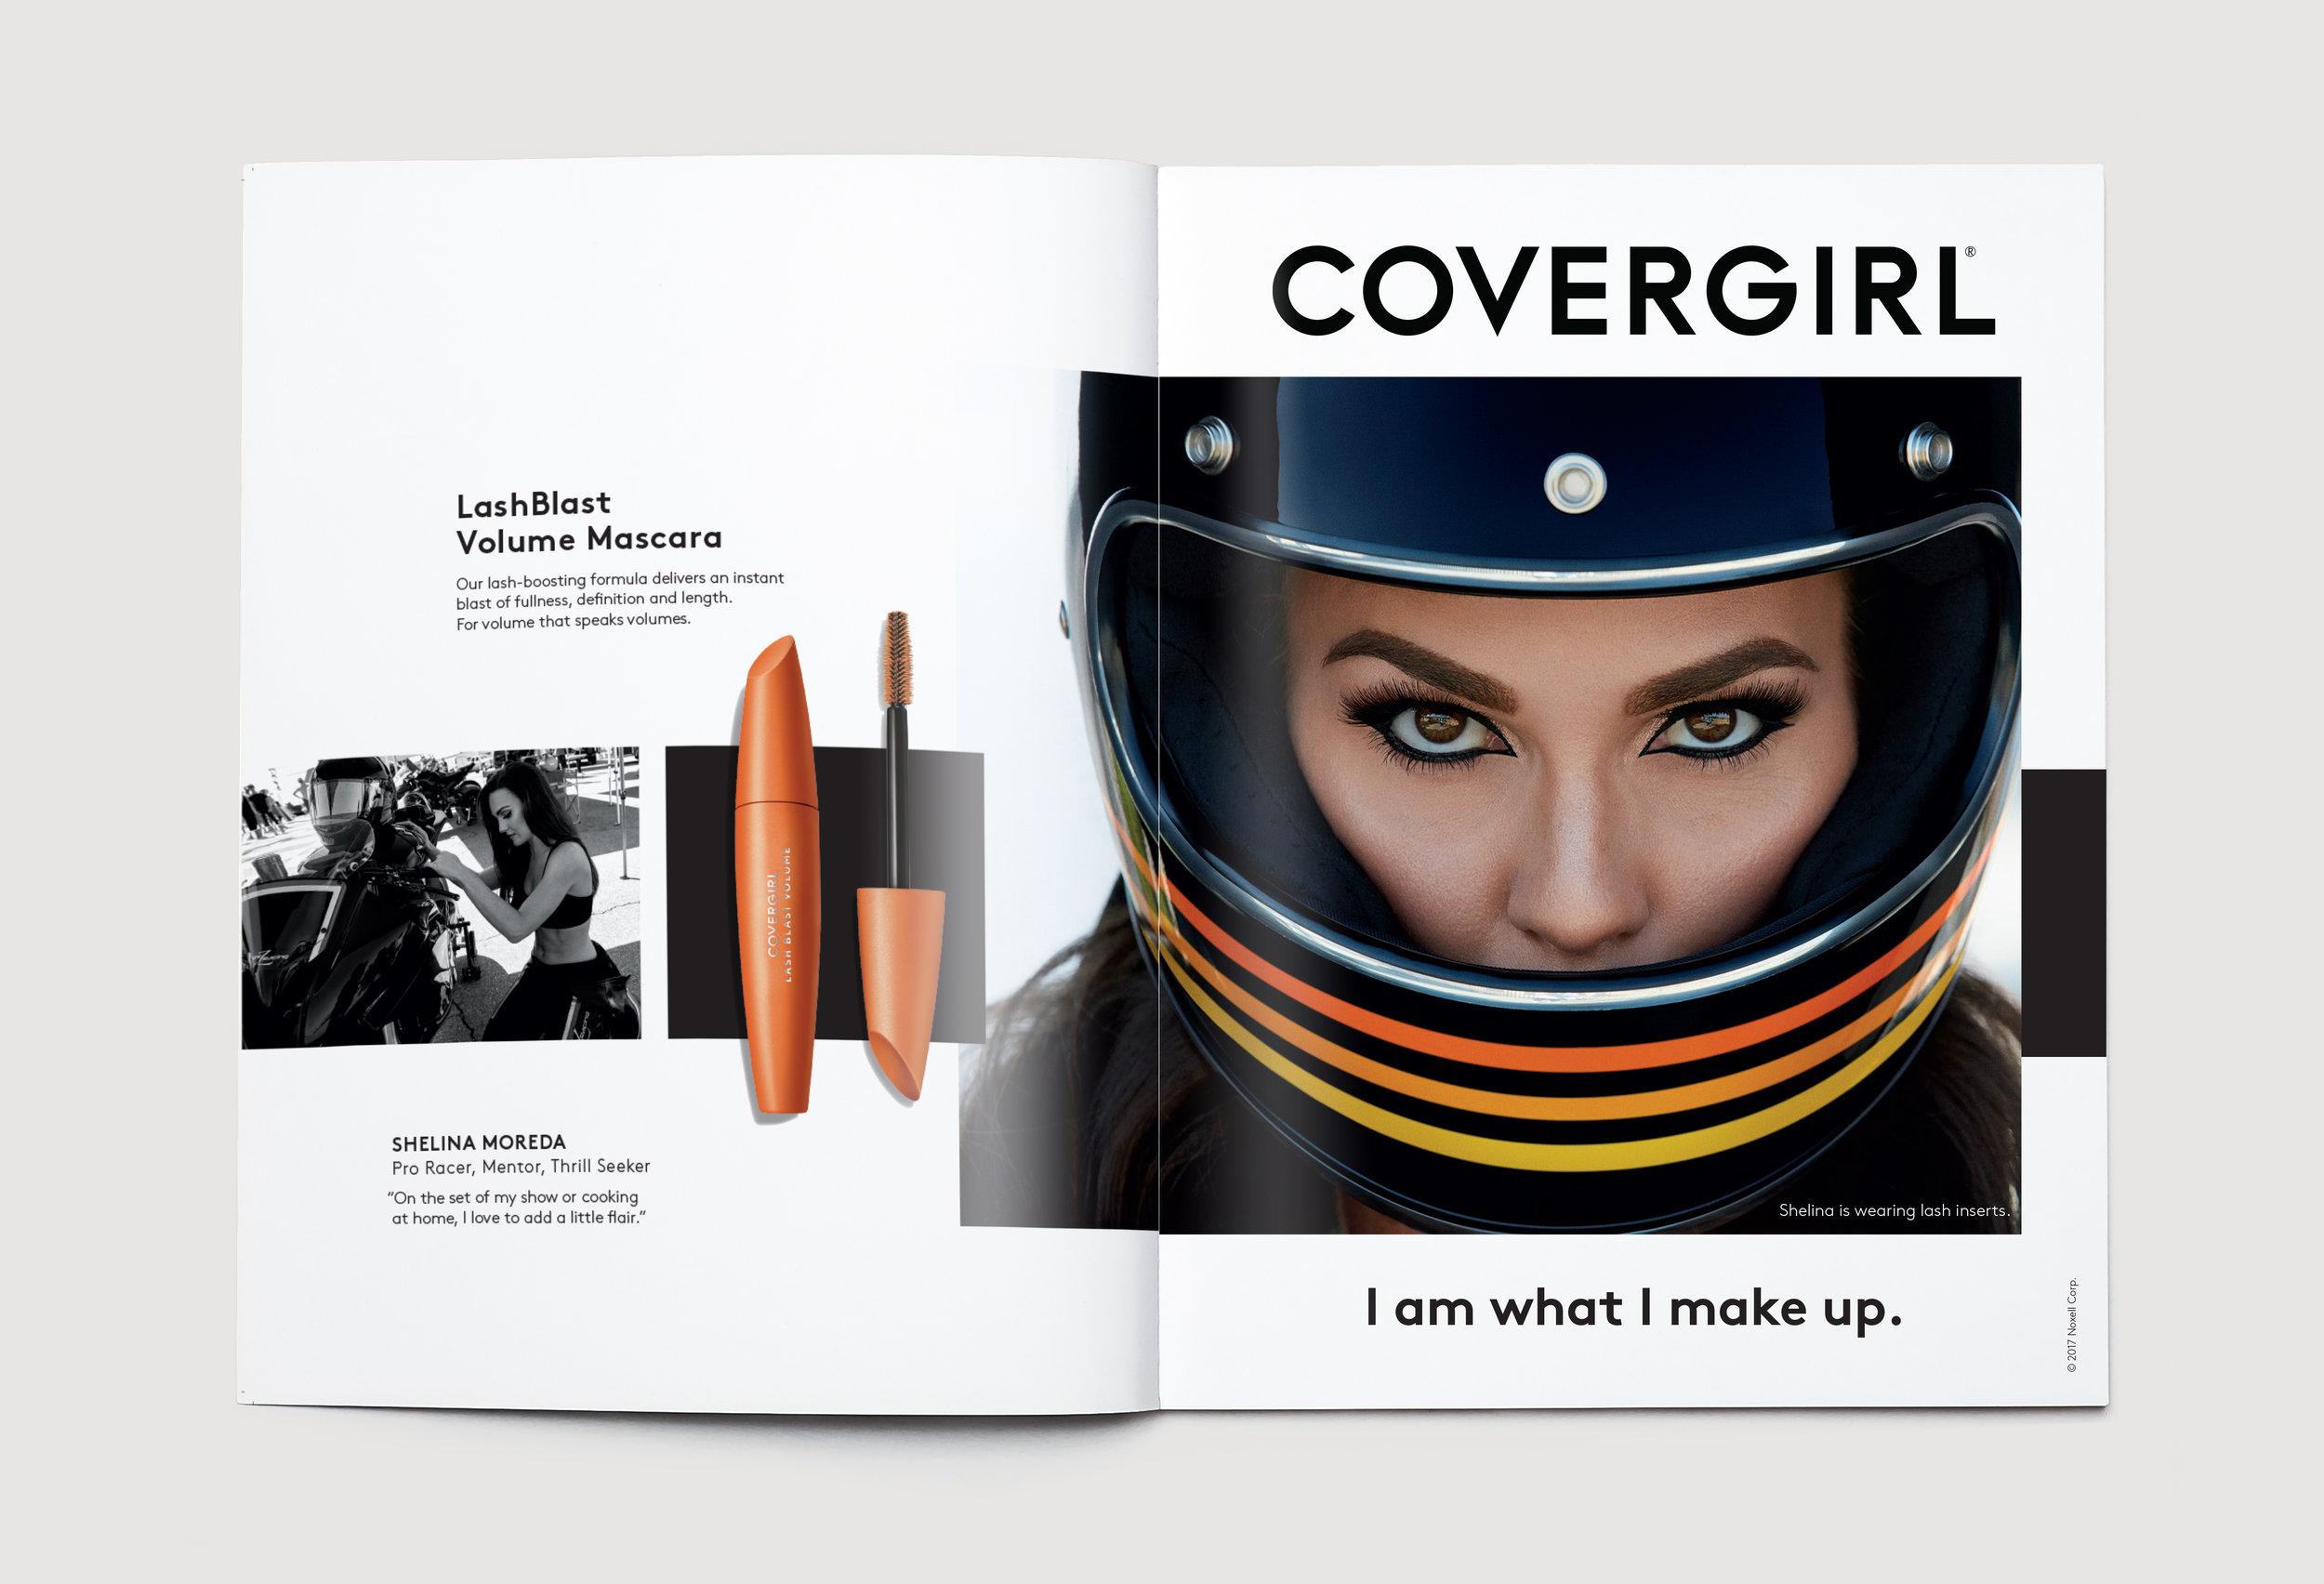 COVERGIRL spread 1.jpg